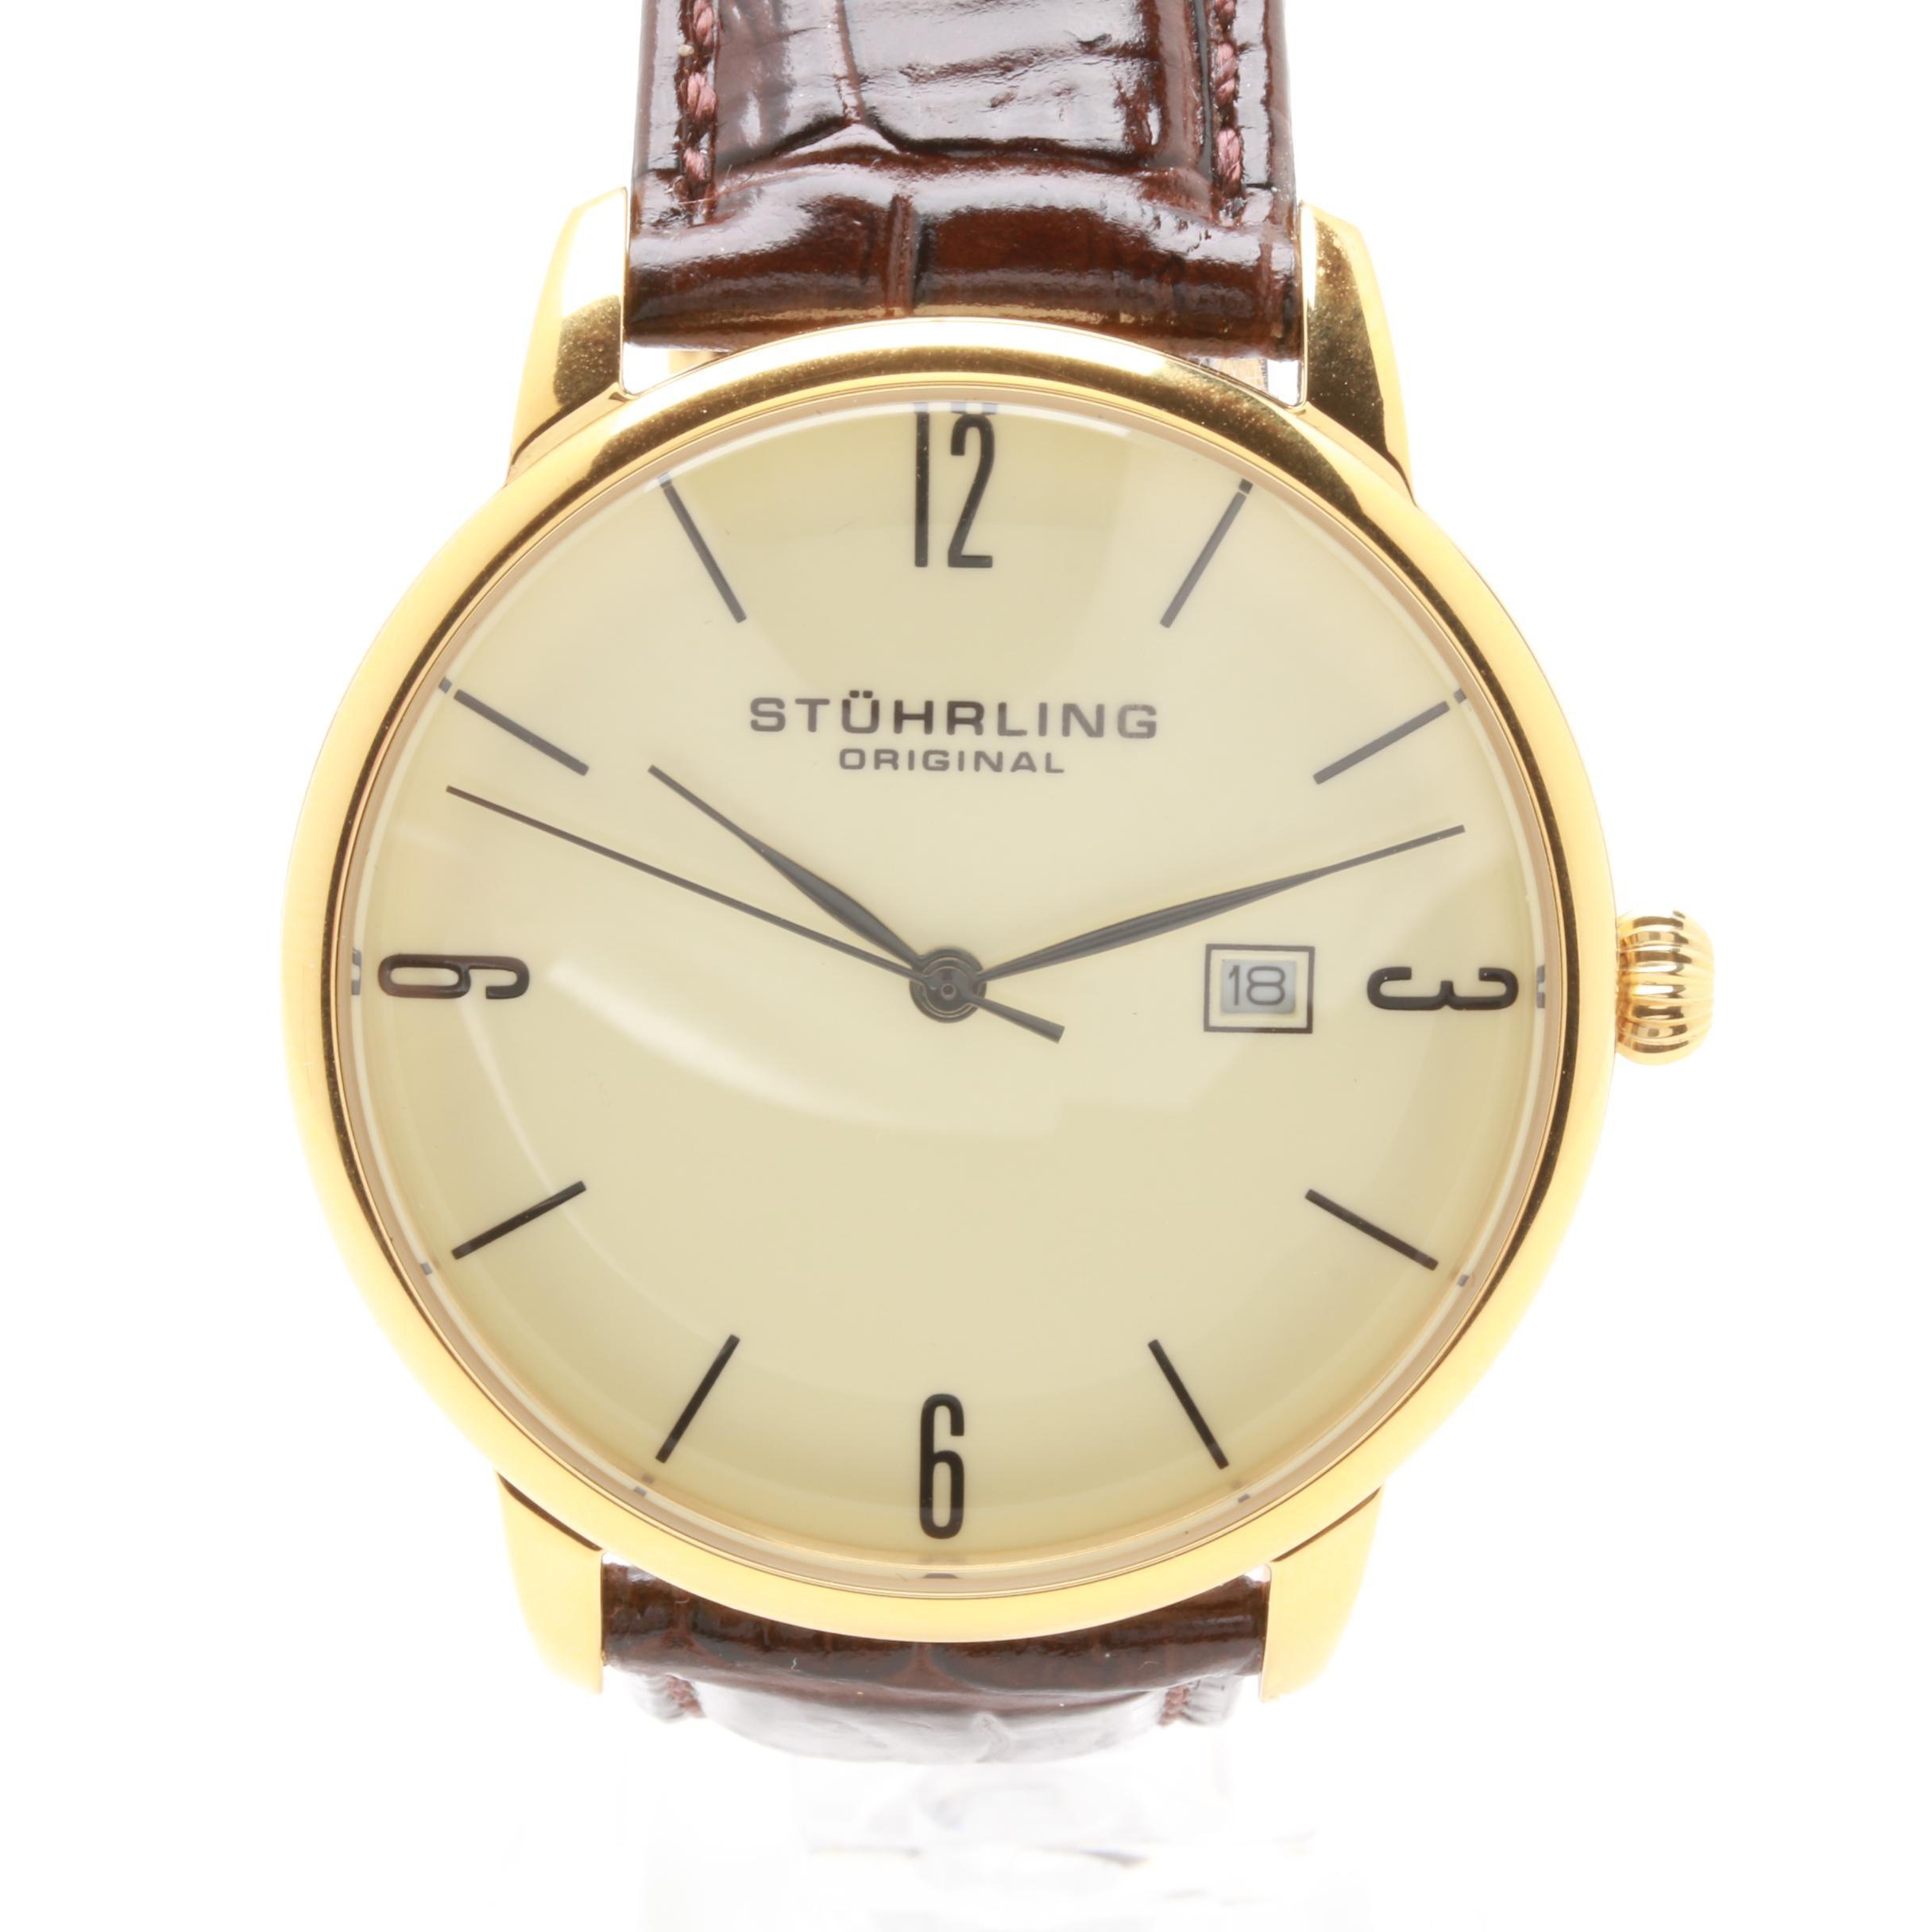 Stührling Original Gold Tone Stainless Steel Wristwatch